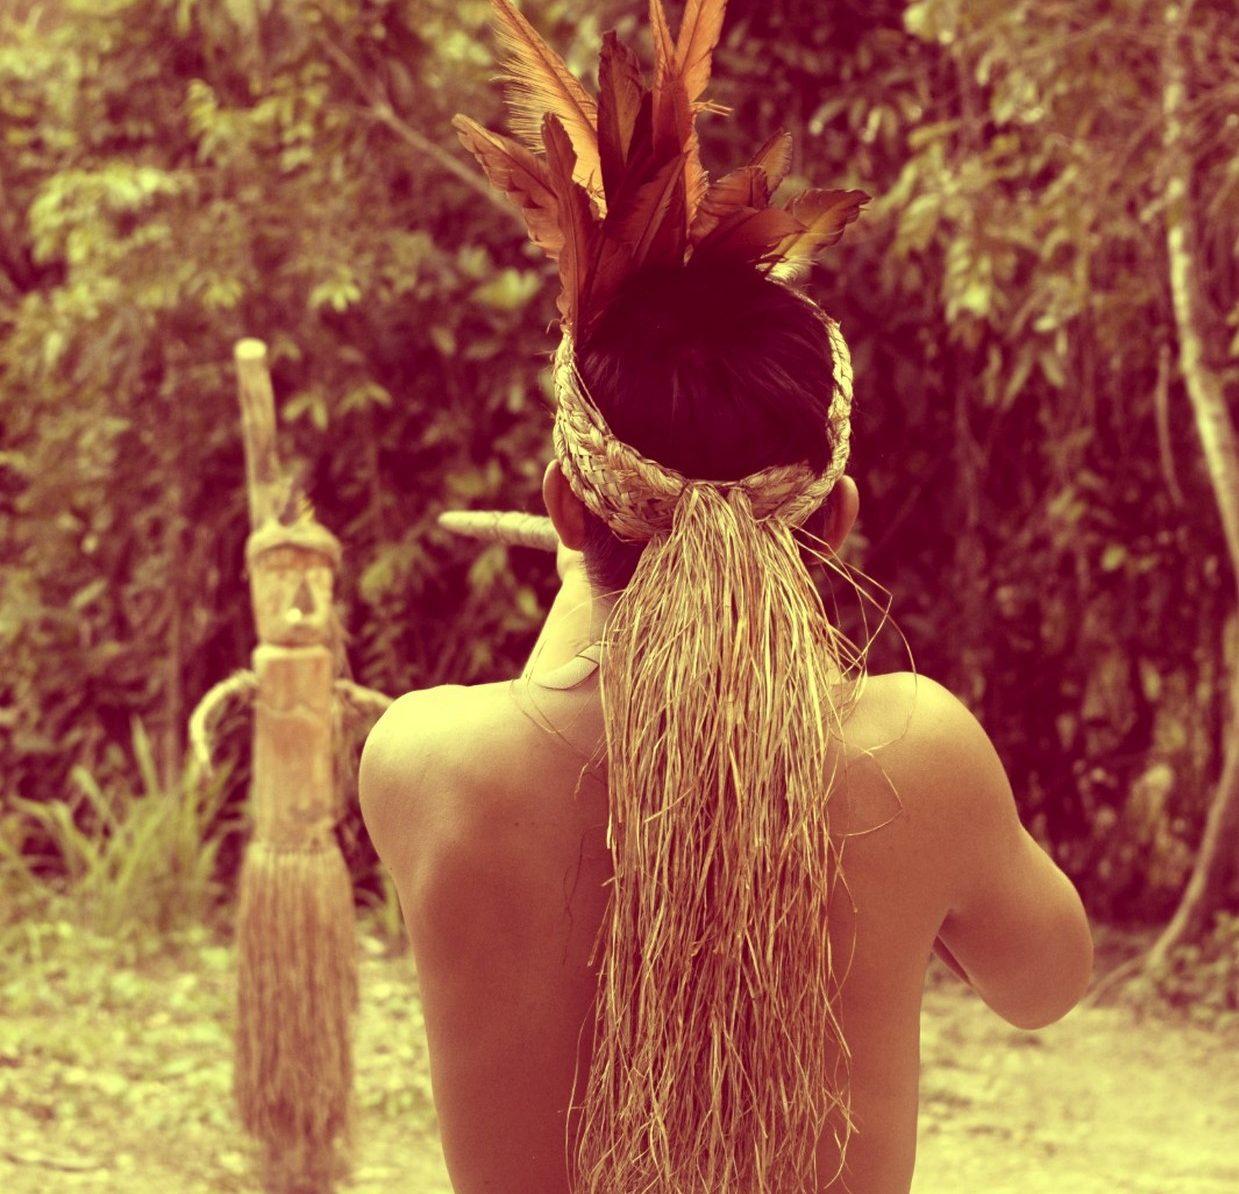 Yanayacu & Amazon River Tour - 4 Days 2